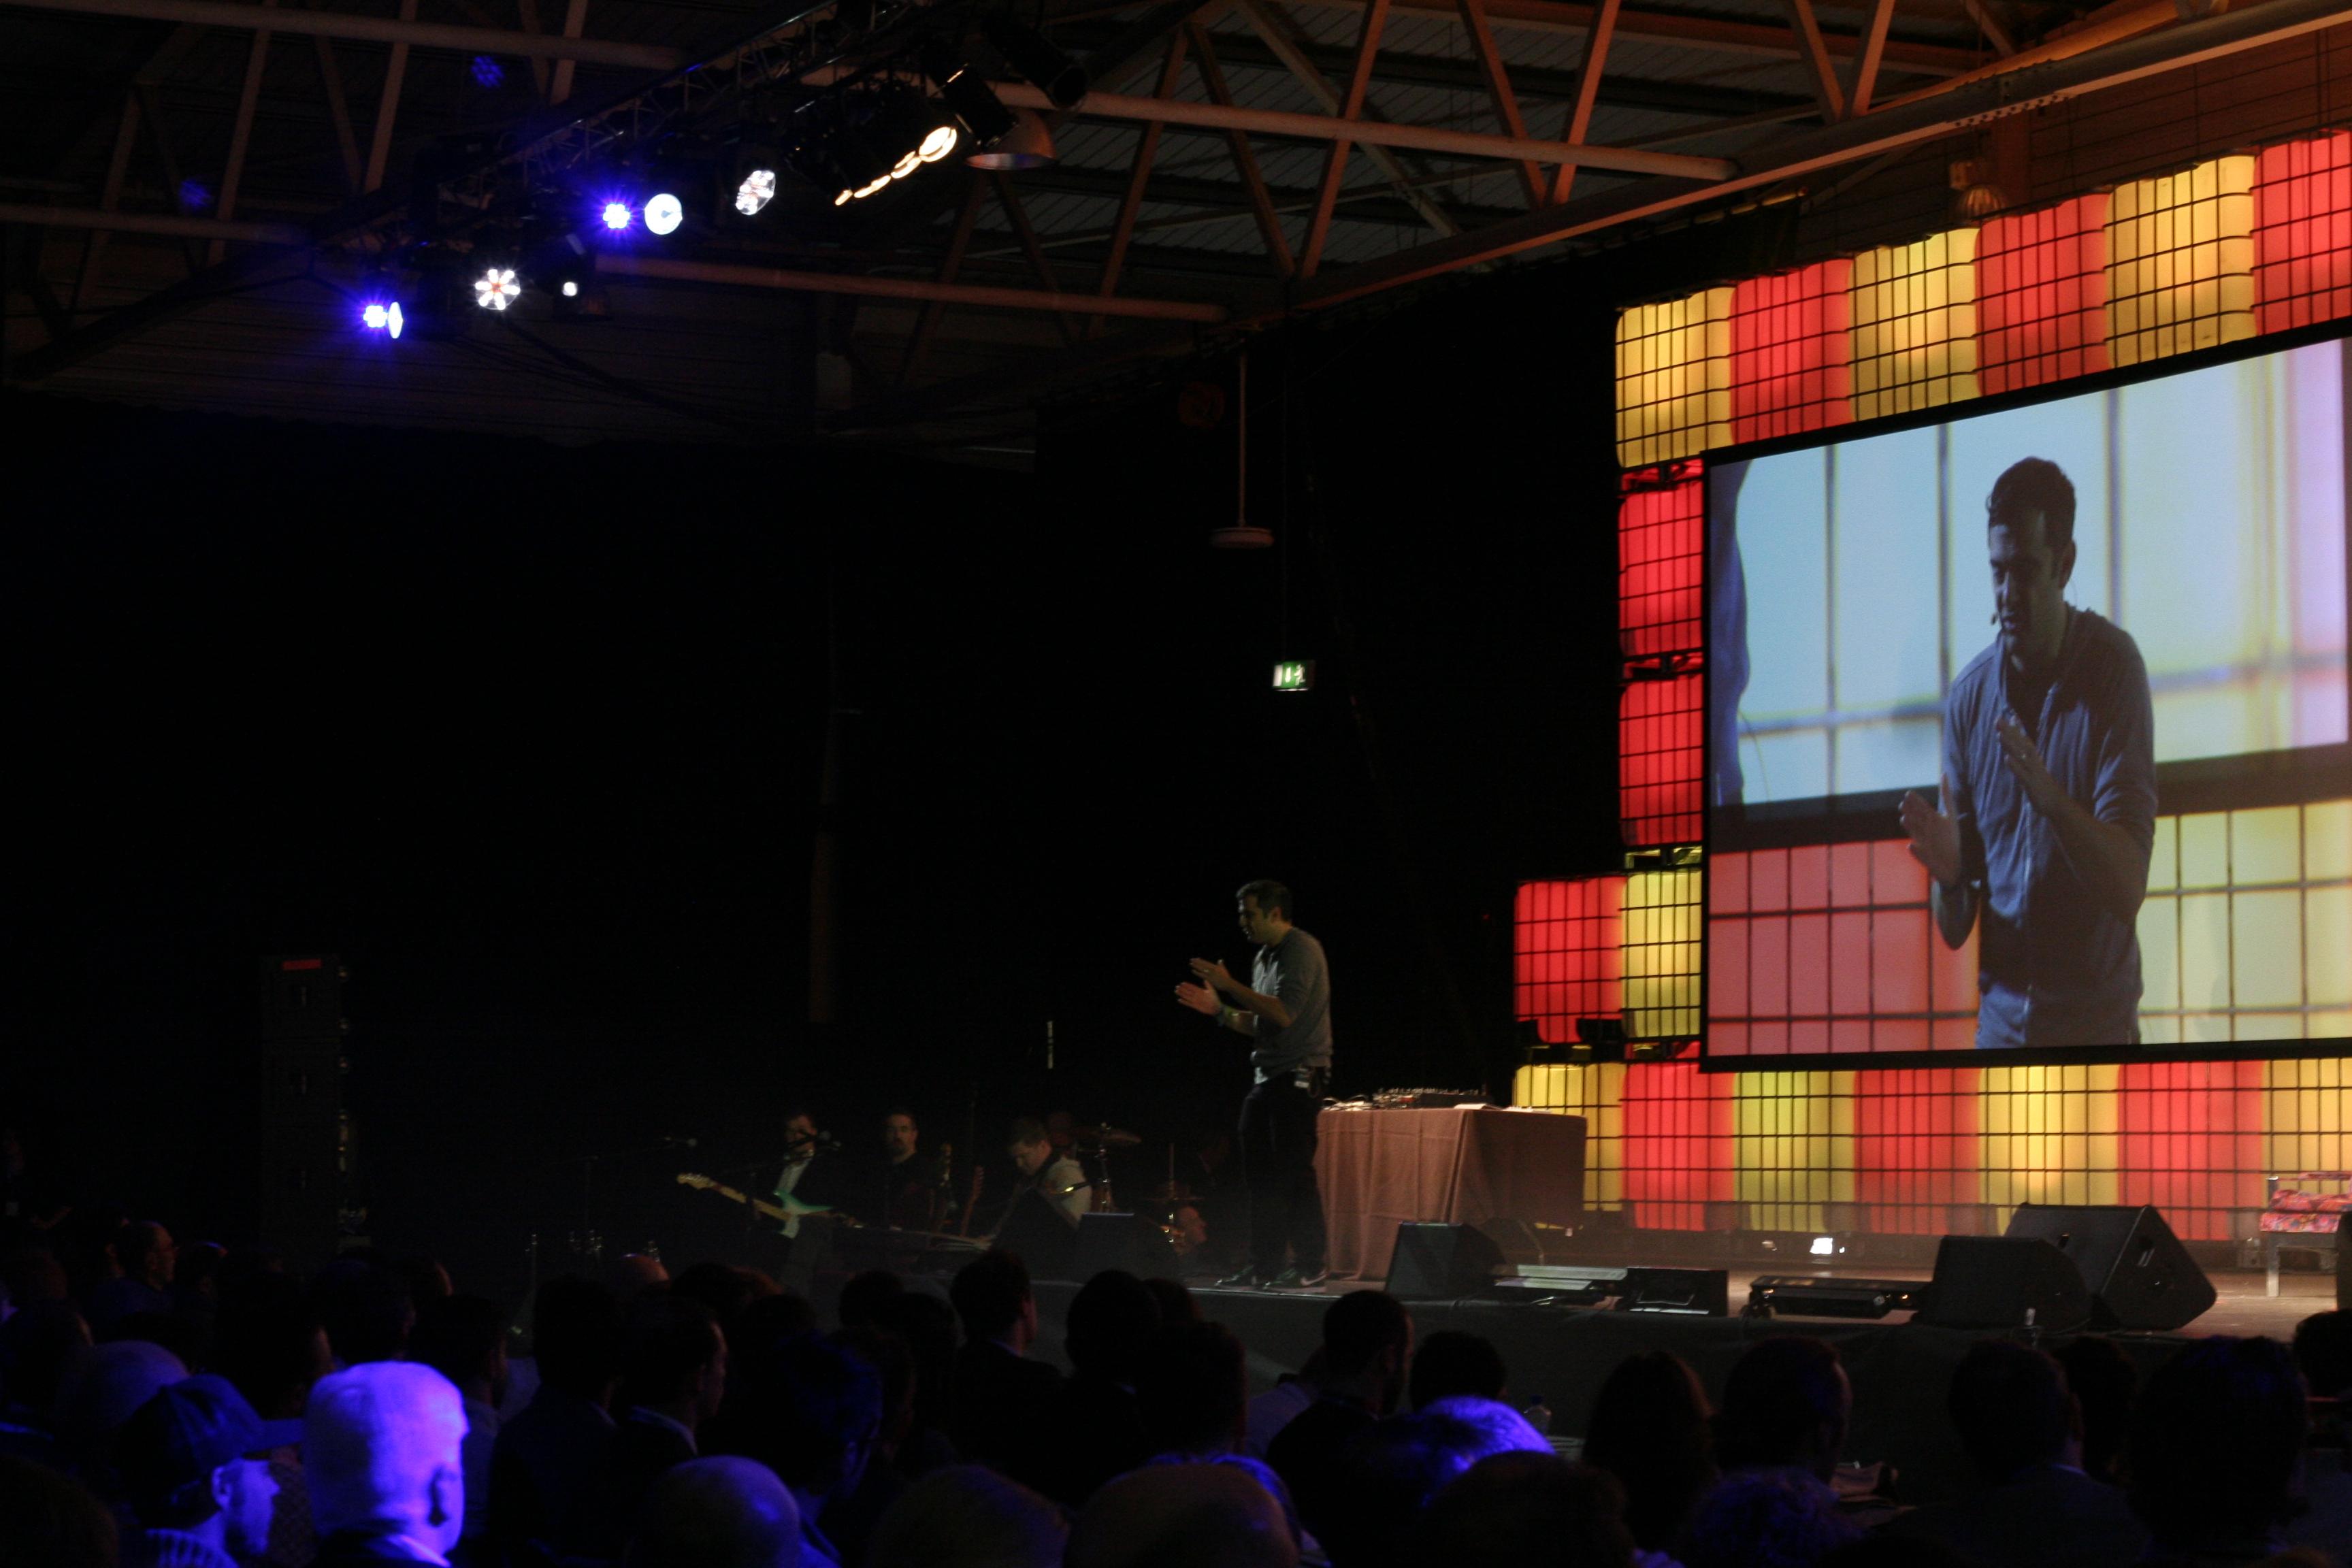 Gary Vaynerchuk talks no bullshit policies with regards to consumers